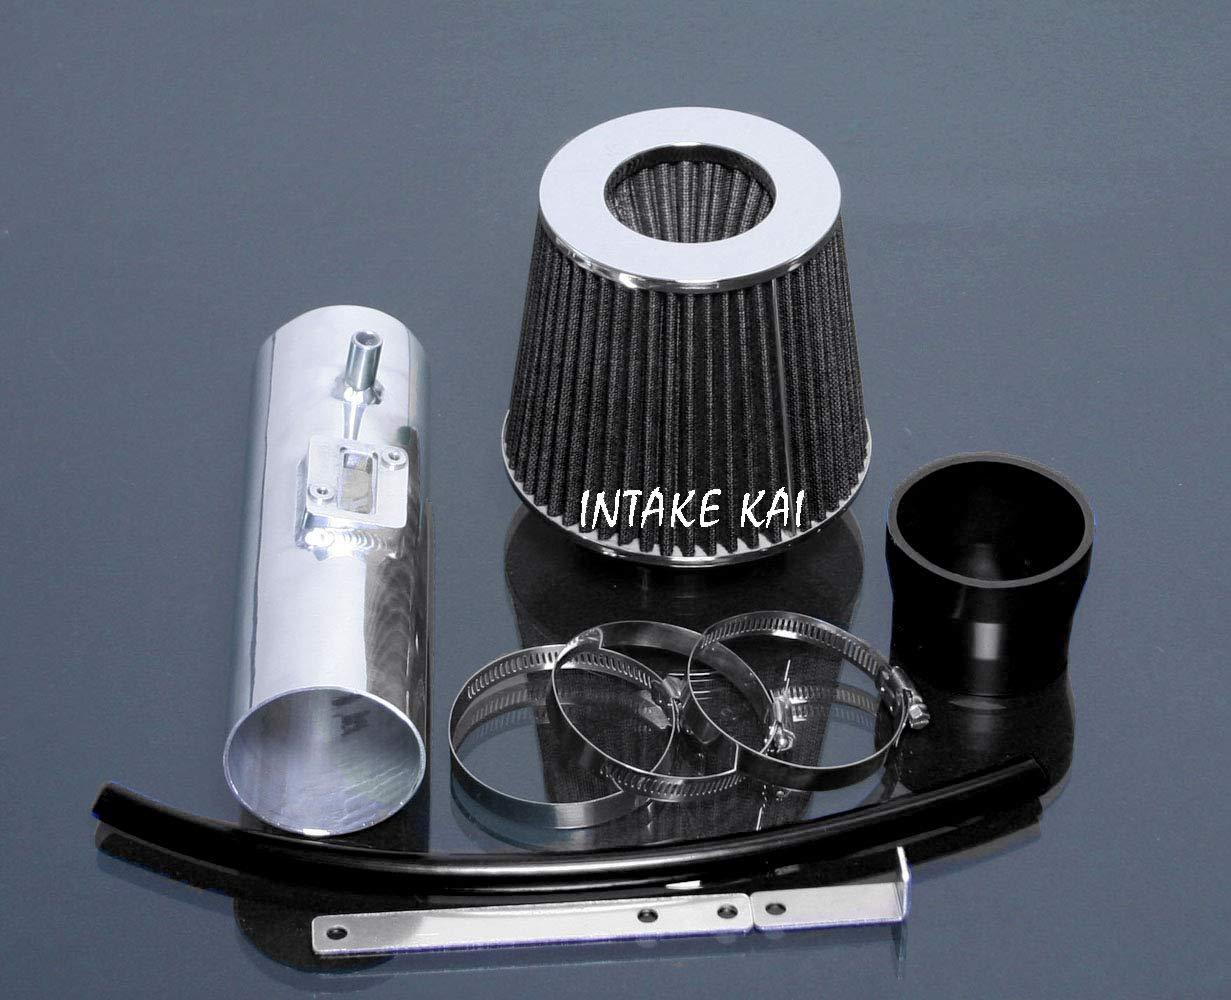 BLACK PERFORMANCE AIR INTAKE KIT FILTER FOR 2009-2014 ACURA TL 3.5 3.5L V6 ENGINE